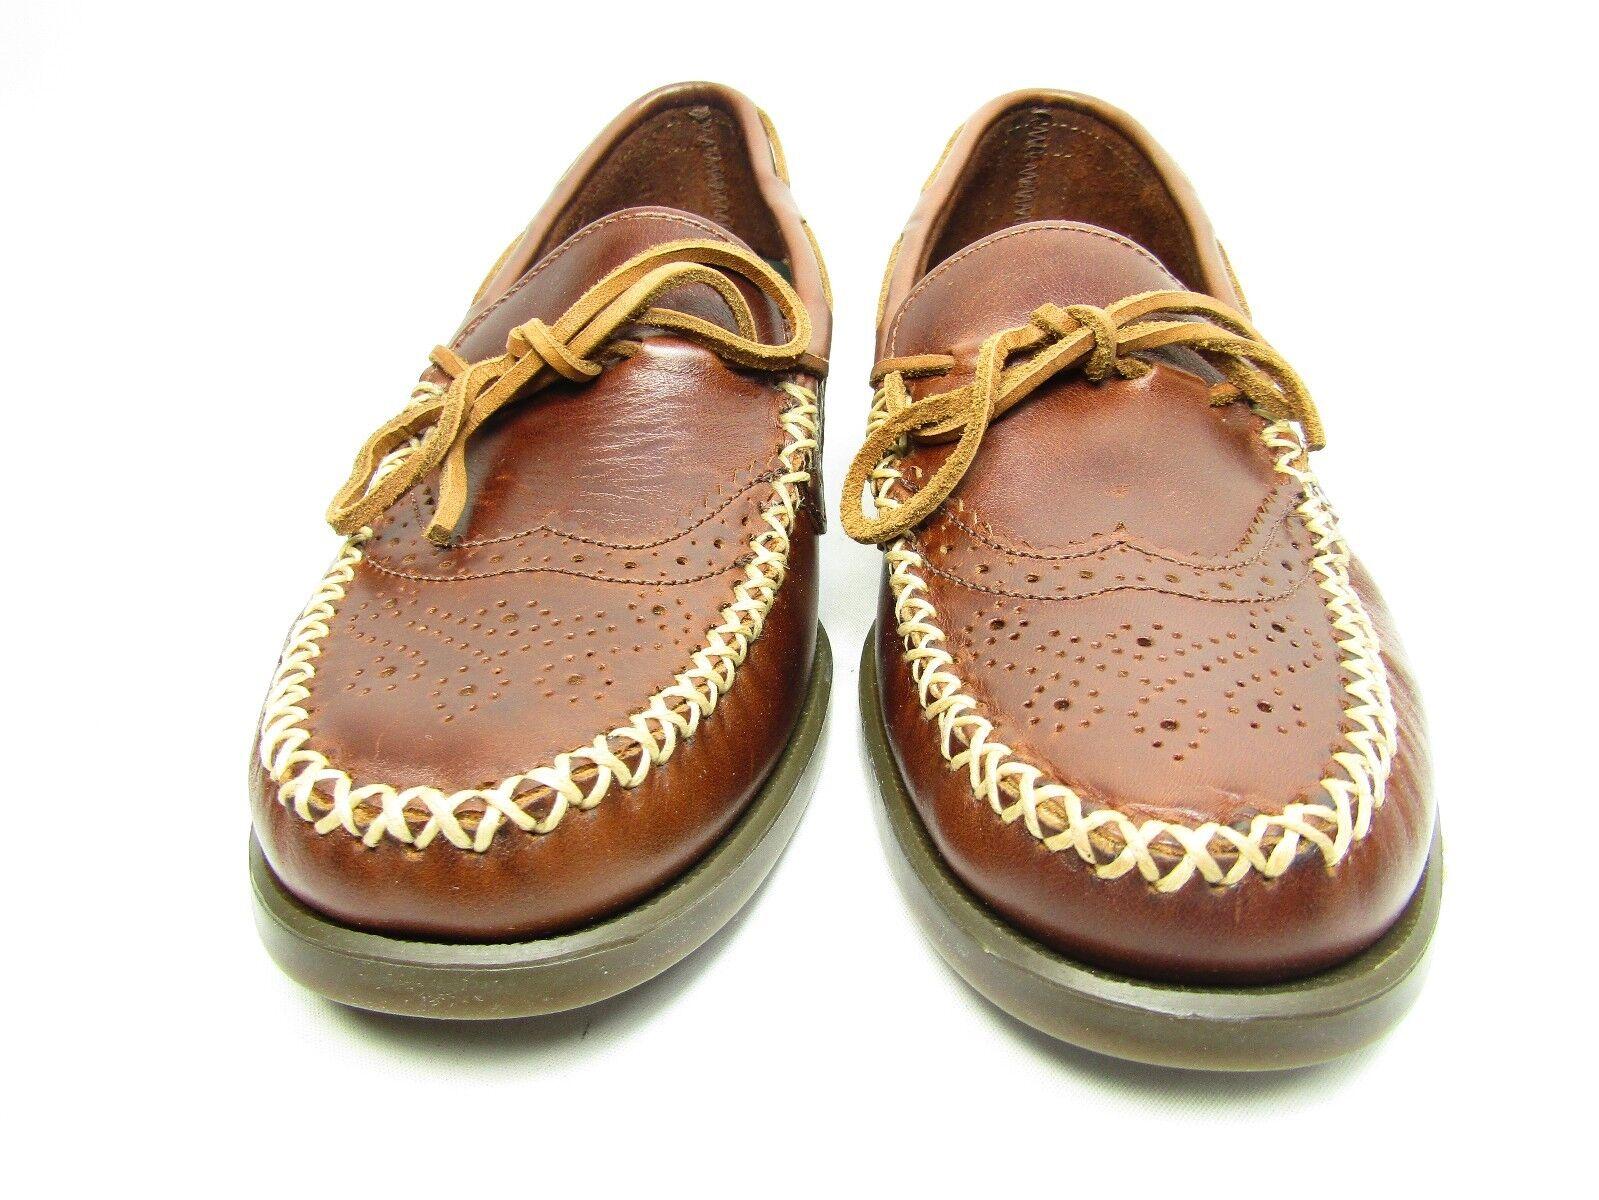 Sebago Campsides Wingtip  Moccasins Mens  Brogue  Brown Leather shoes Size 7M